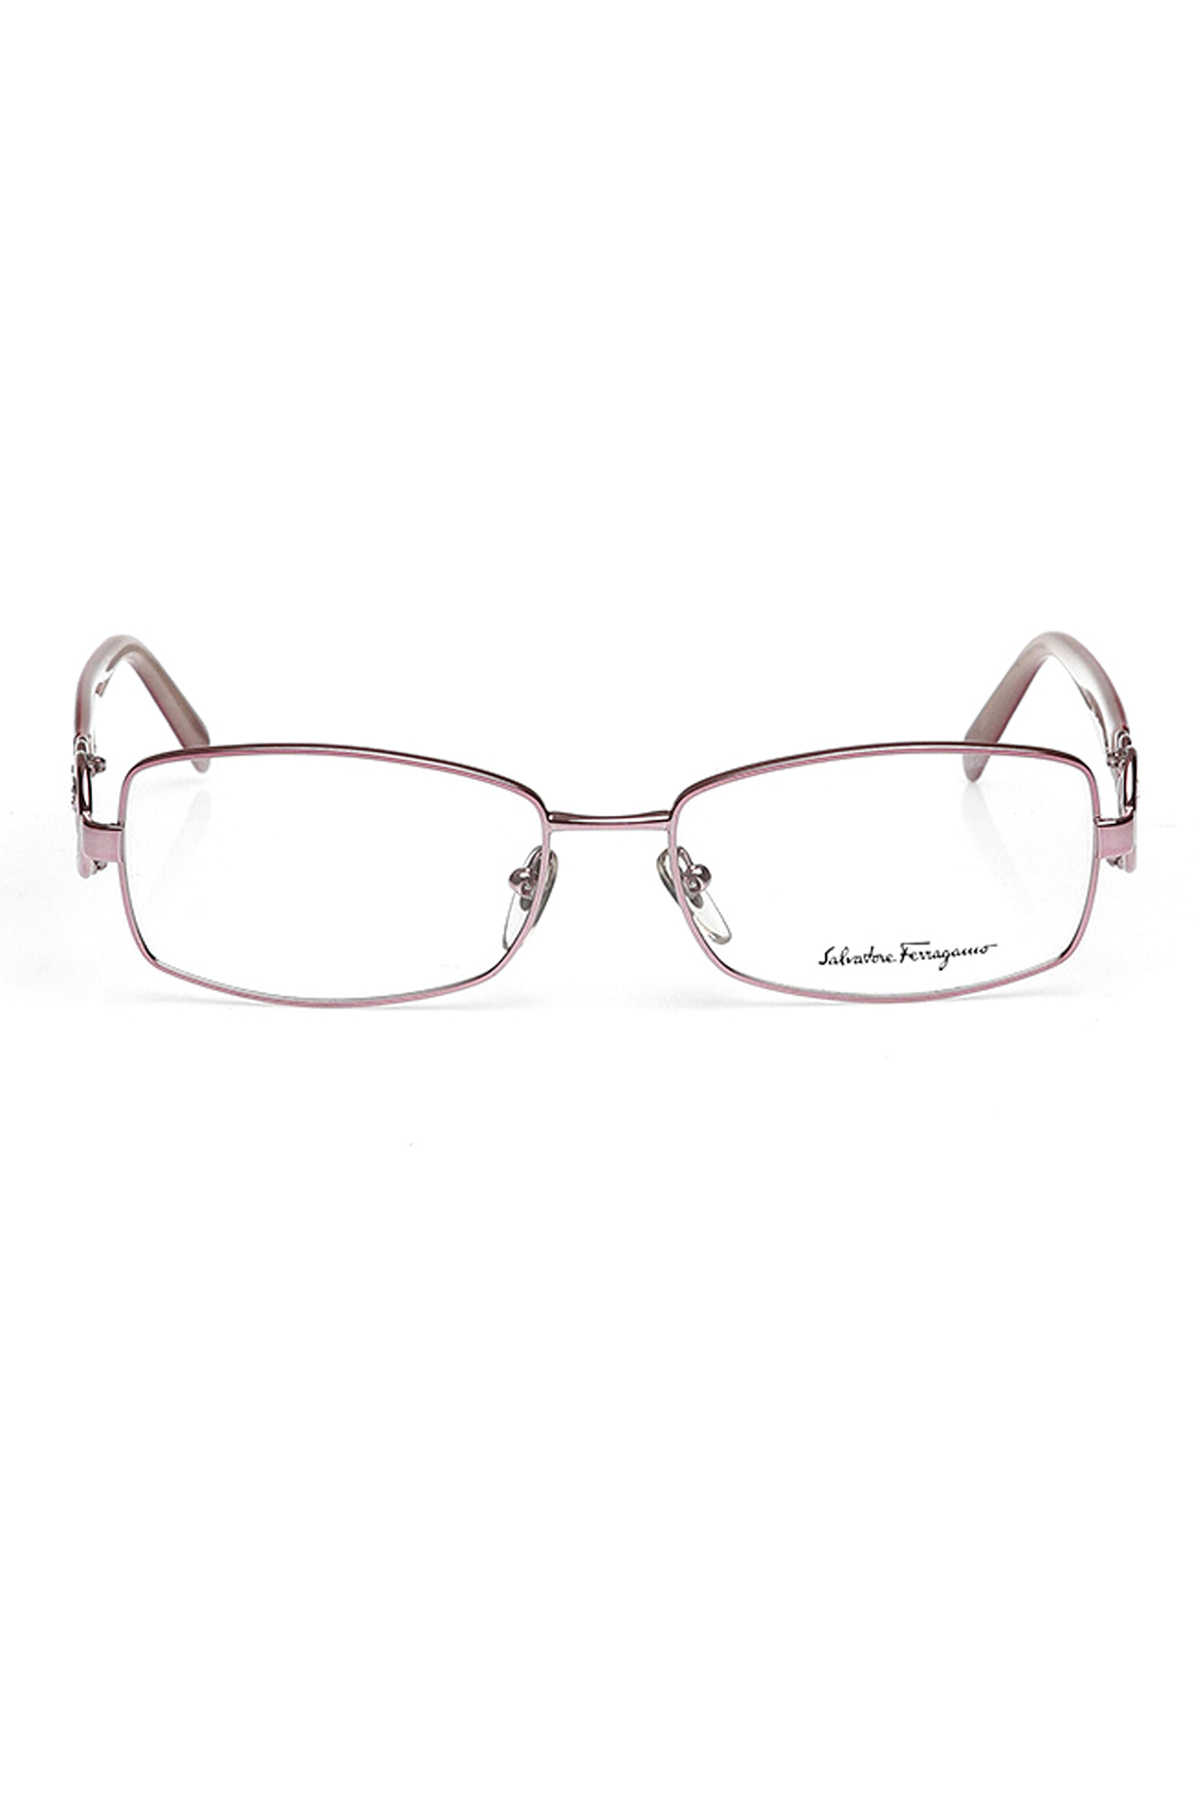 Markamilla Vrouwen Leesbril Frame Demo Bril Eyewear Transparante Hoge Kwaliteit Womensalvatore Ferragamo Sf 1799B 611 54